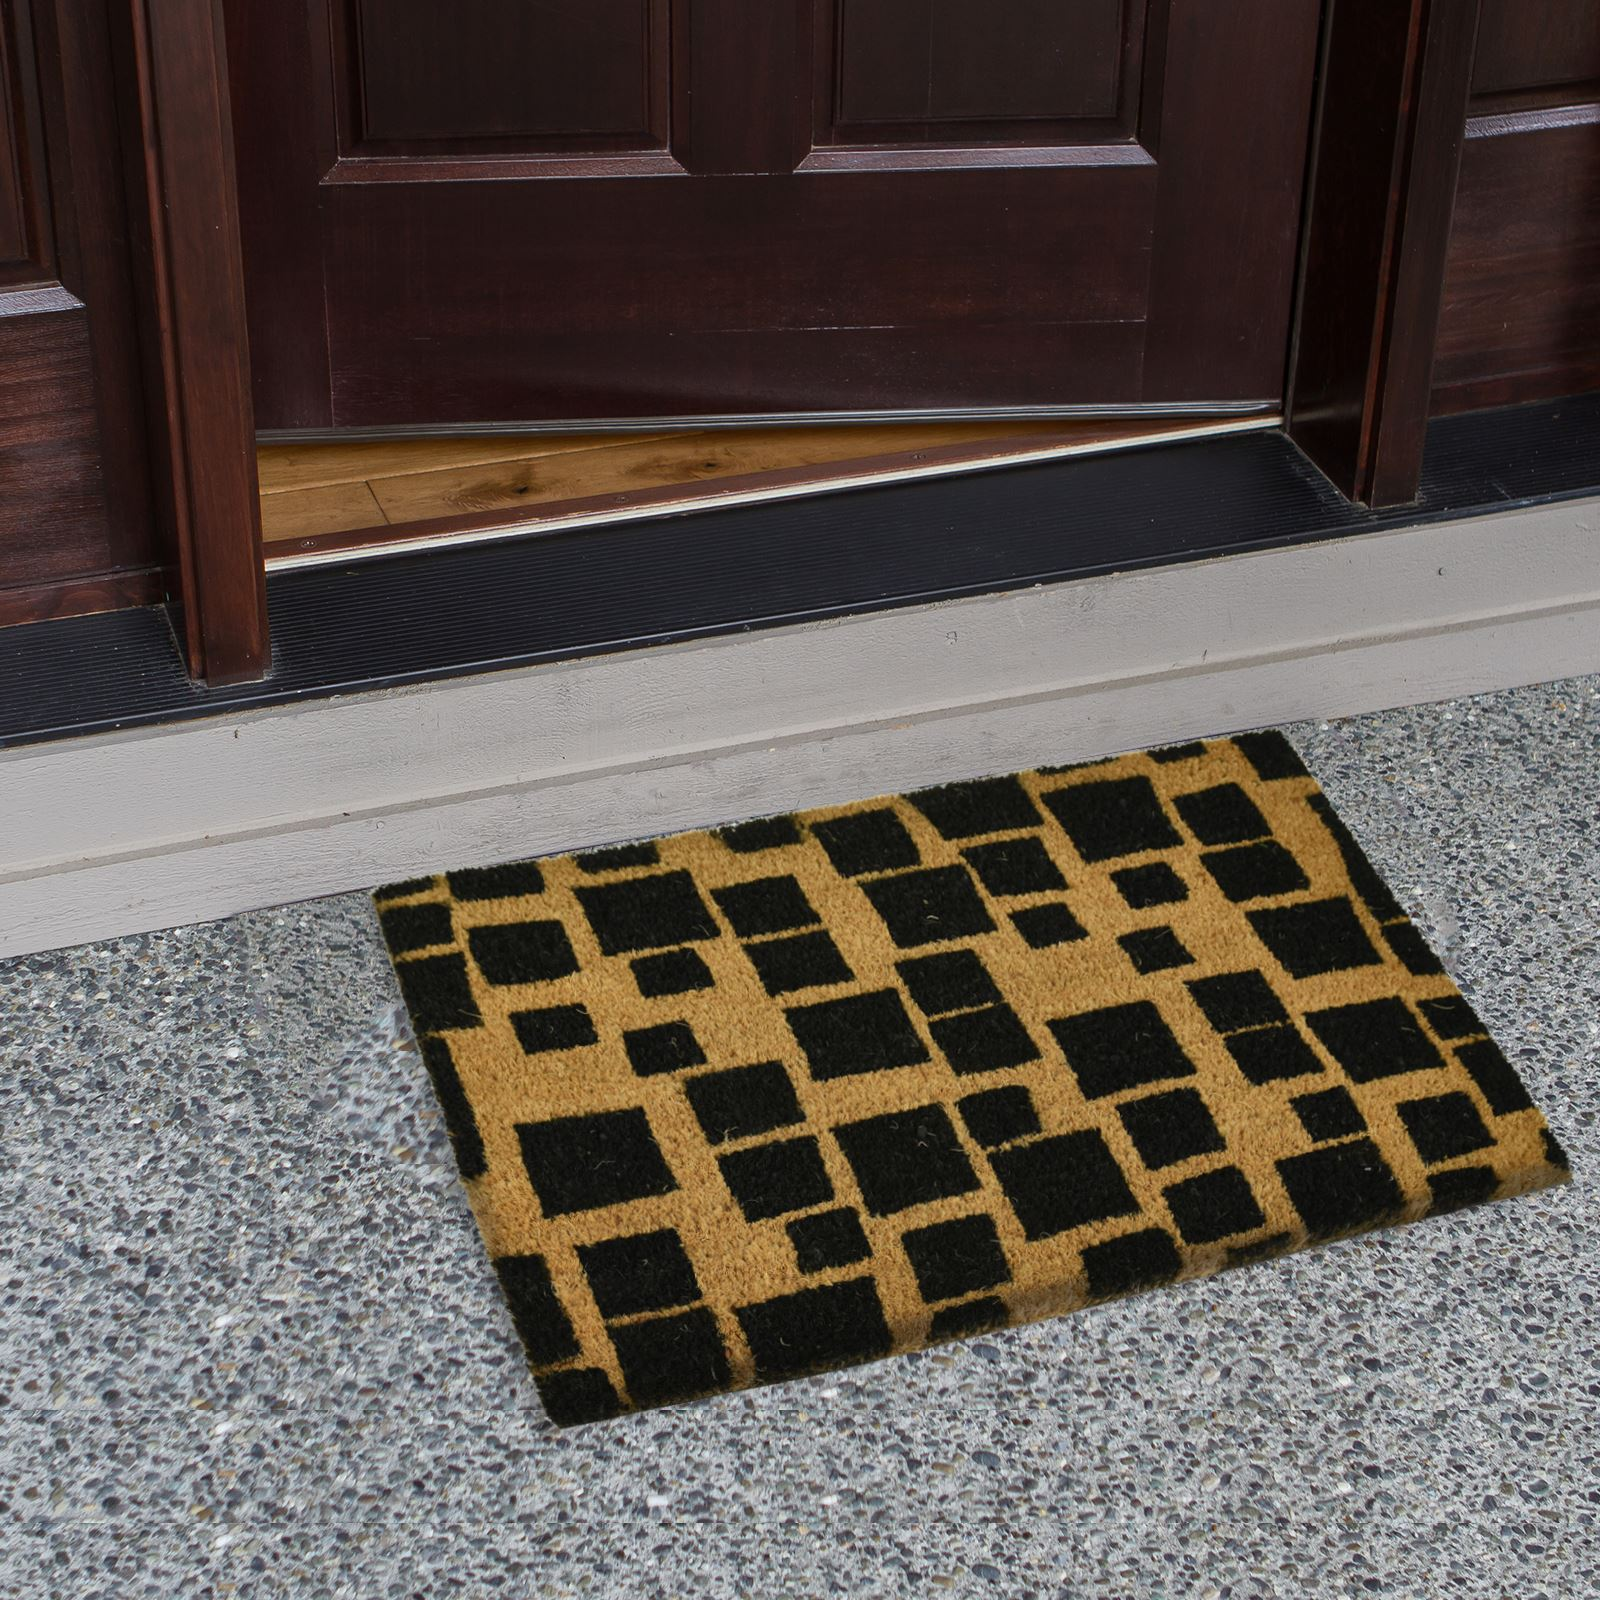 Plain-Non-Slip-Door-Mat-Tough-Natural-Coir-PVC-Back-Welcome-Doormat-40-x-60cm miniatura 20